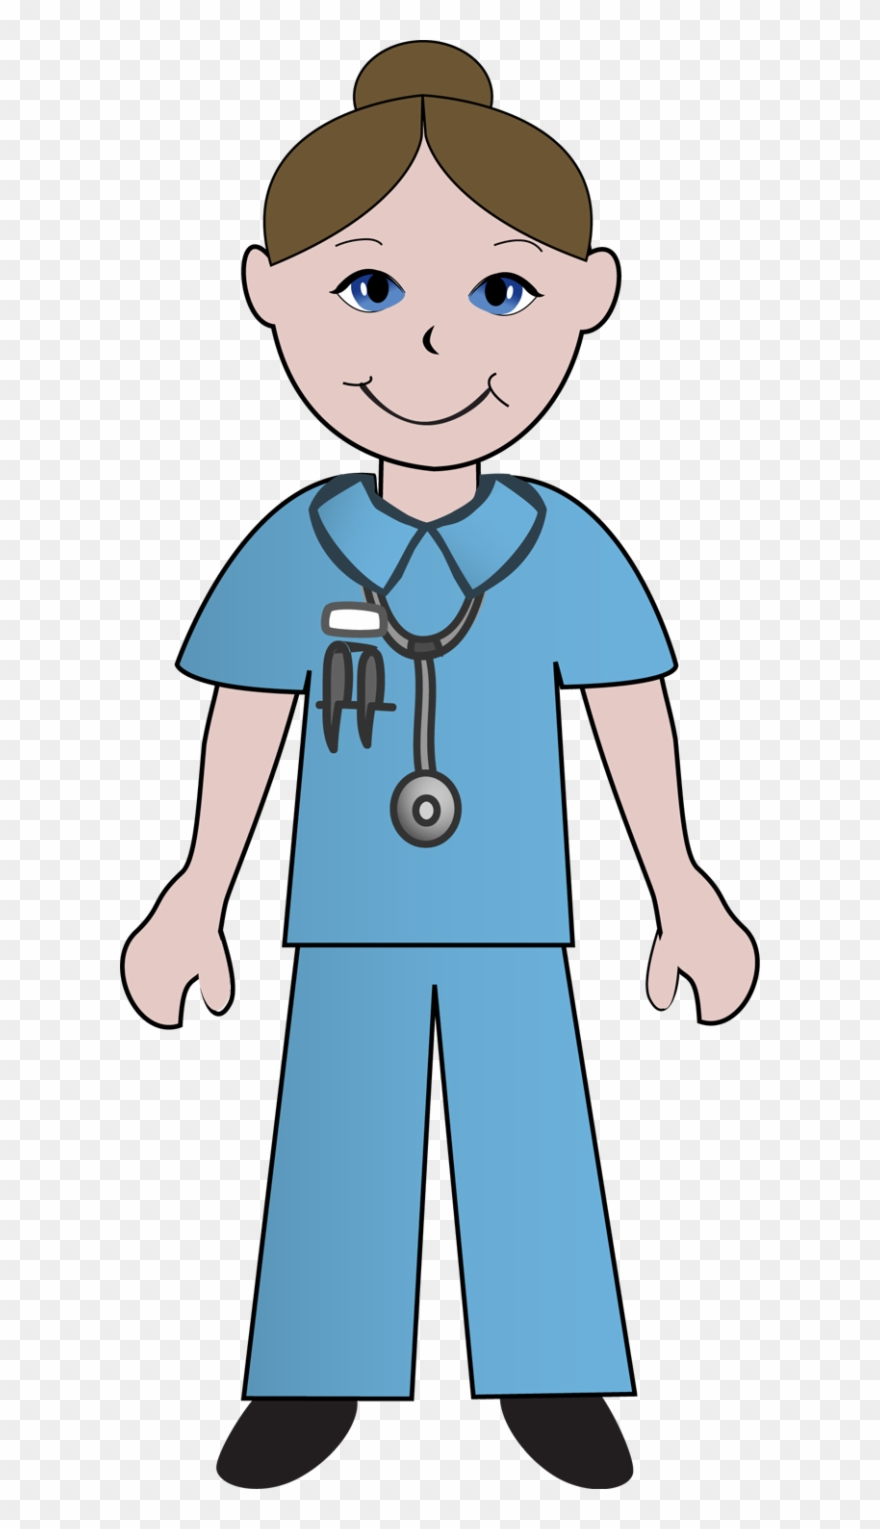 Free Clip Art School Nurse Clipart Image.